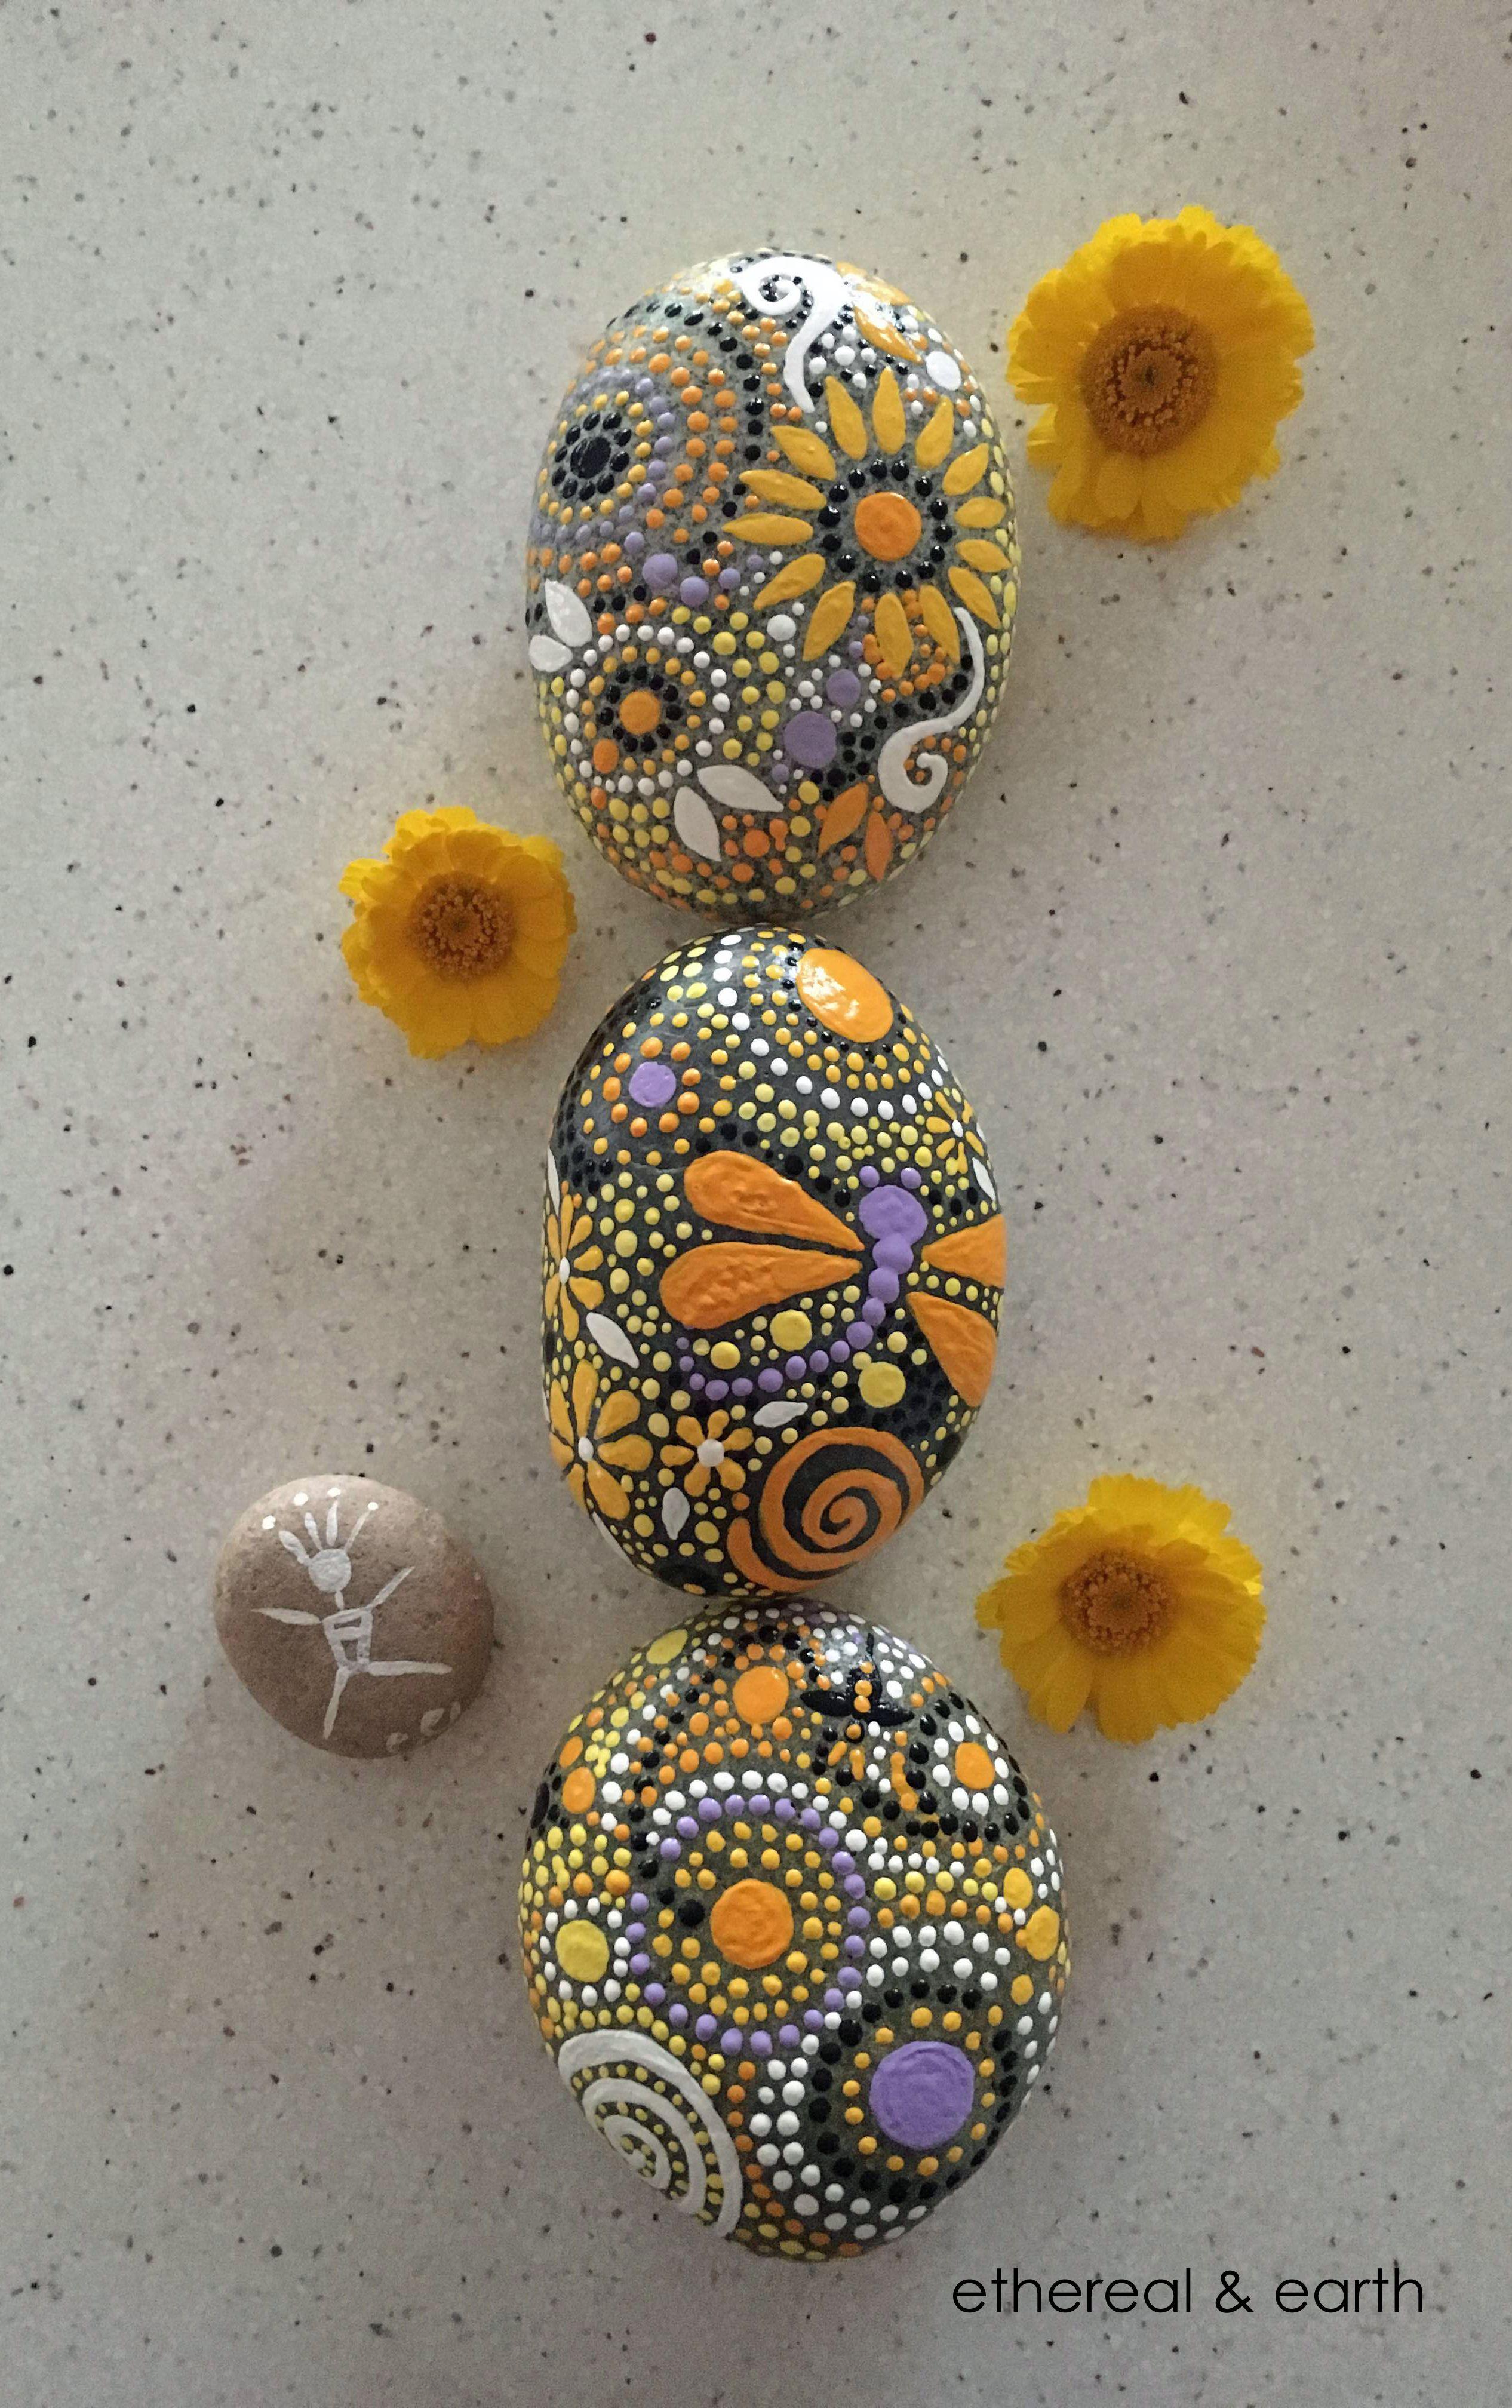 Egg Shaped Rock Paint Ideas